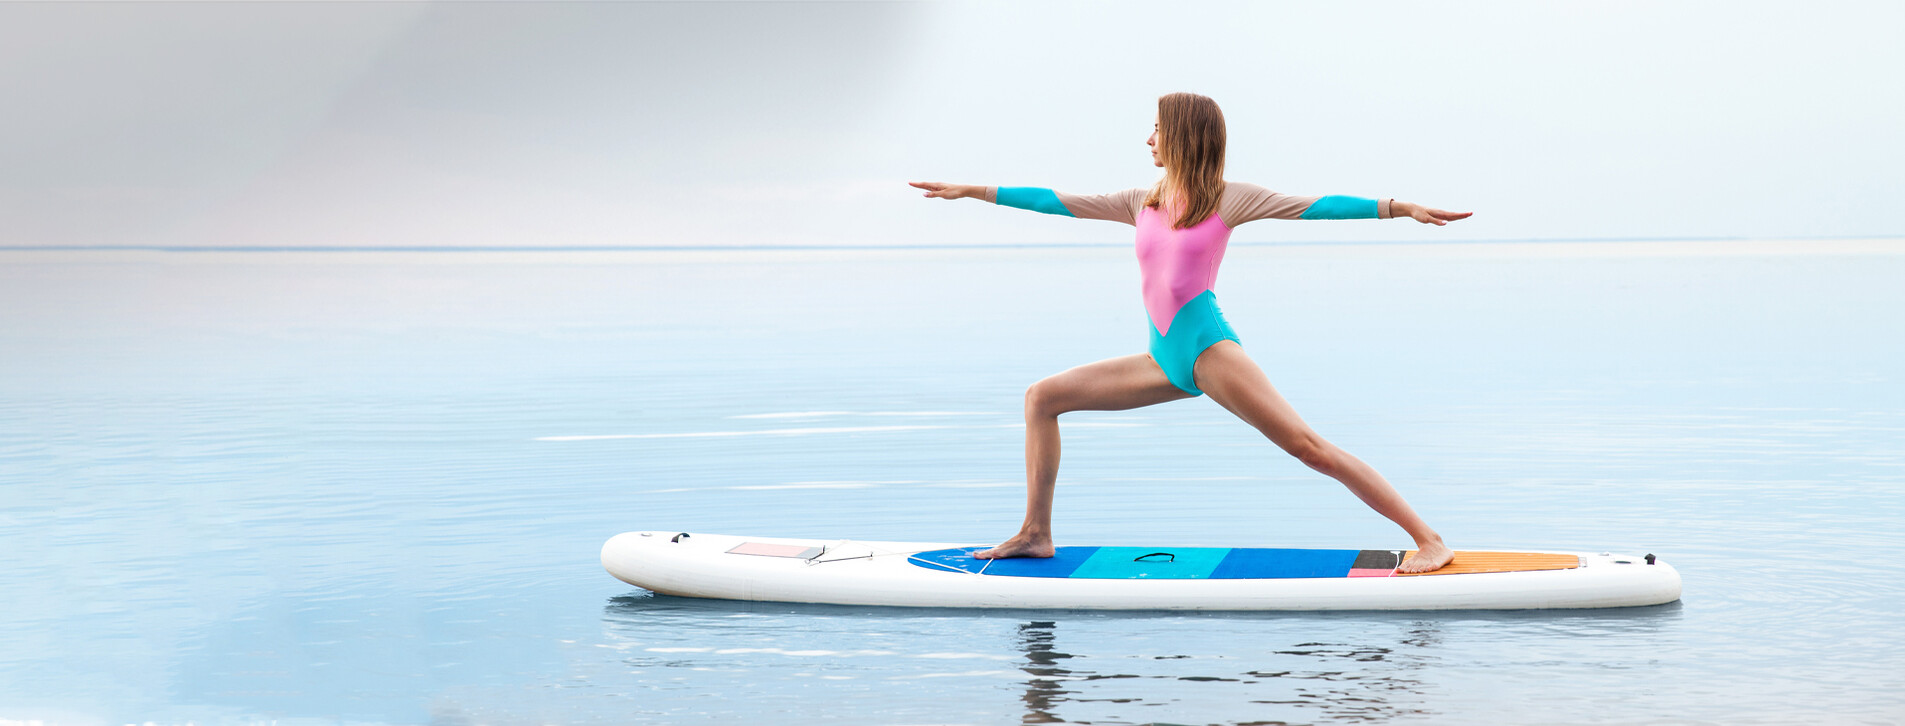 Fotoğraf 1 - SUP Yoga